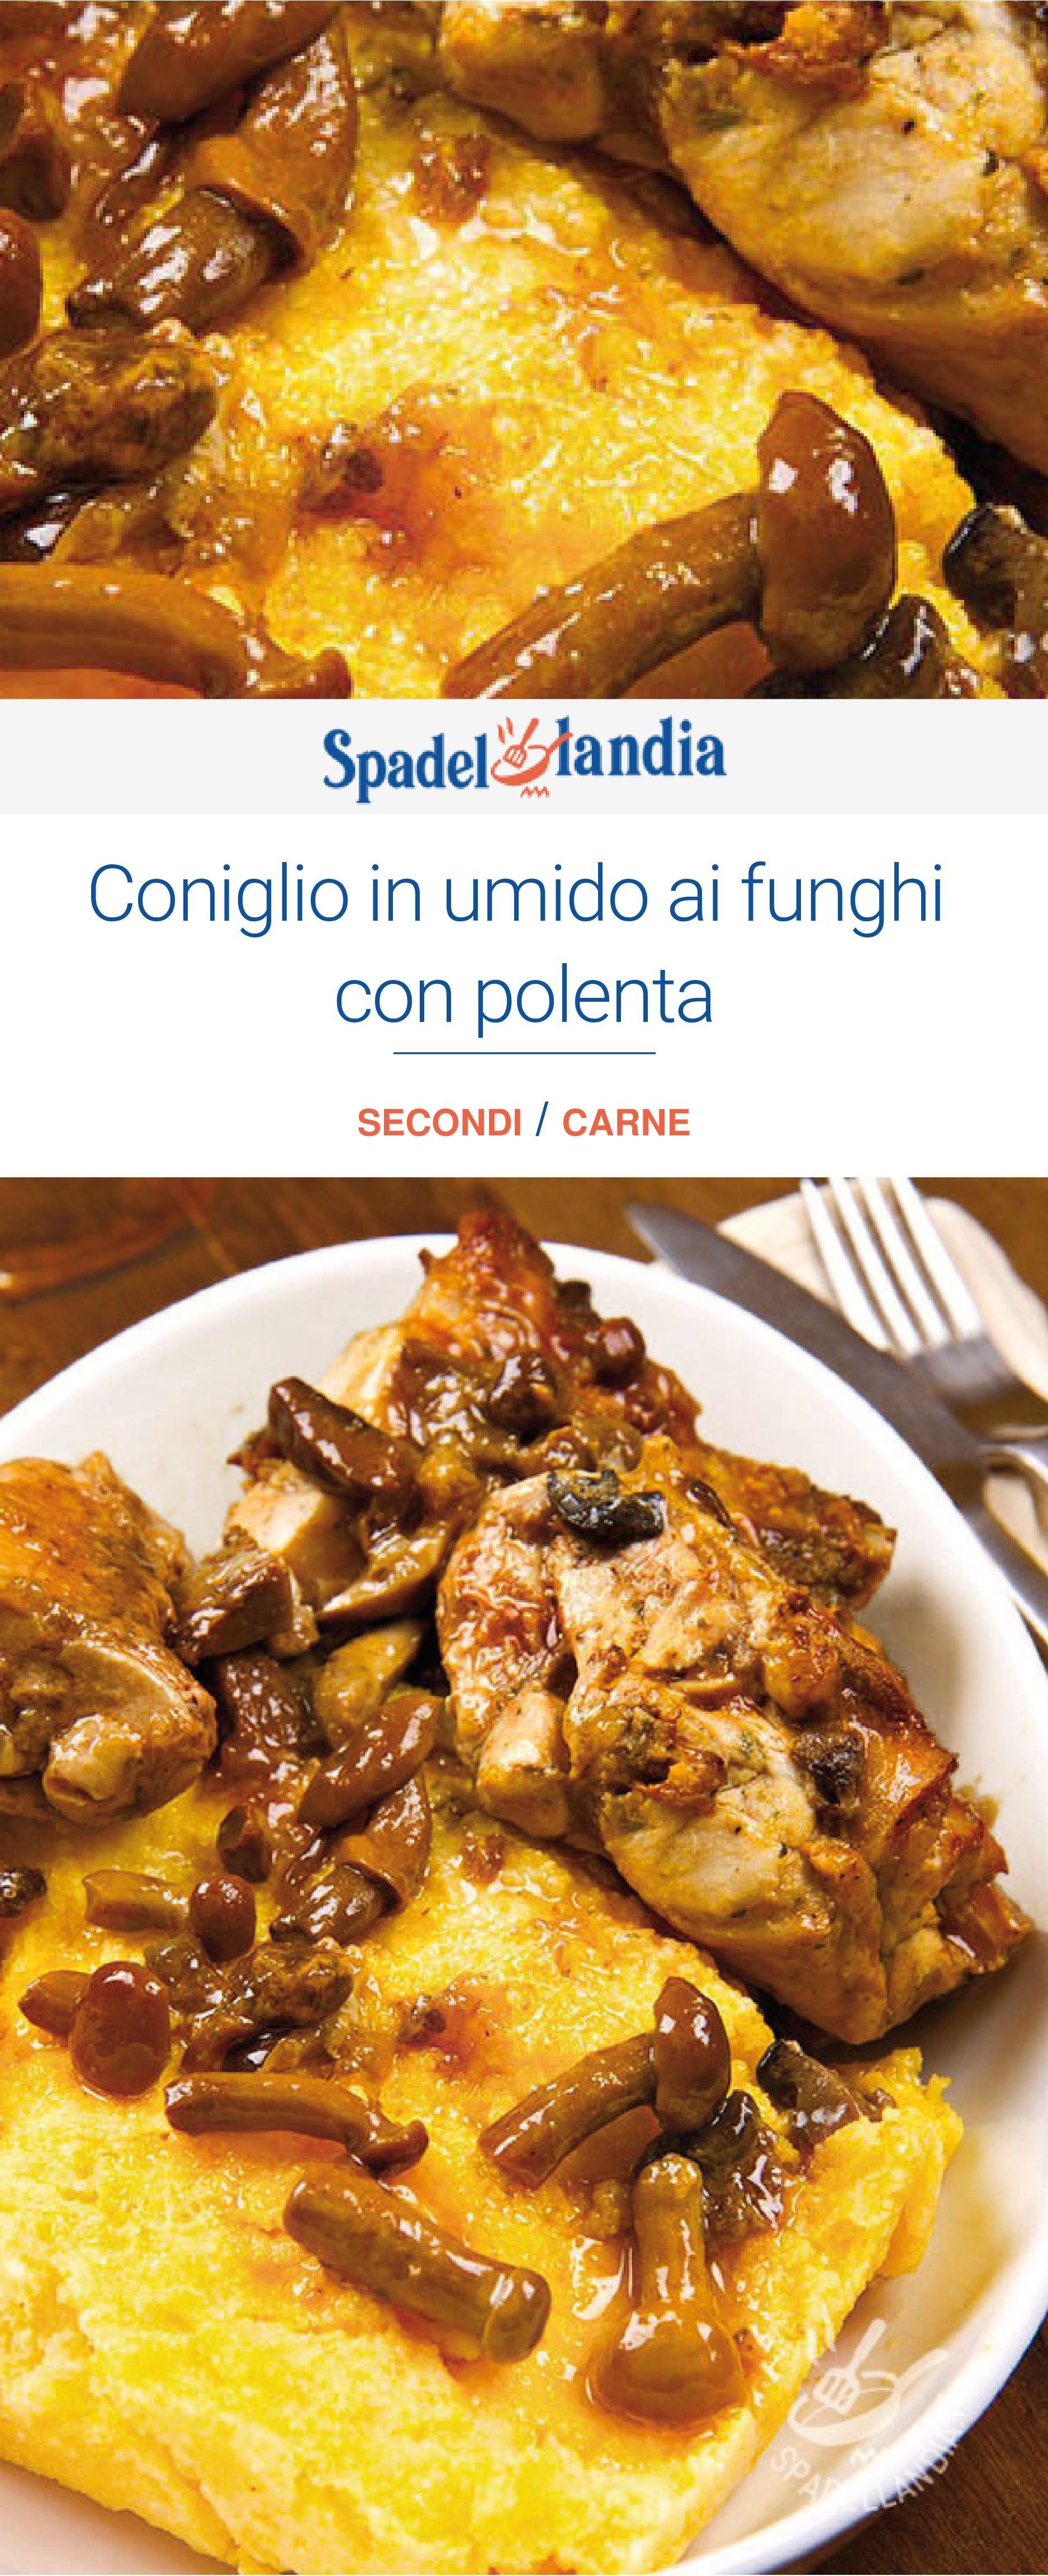 63665f9152ee221798546a88b1001b0c - Ricette Coniglio In Umido